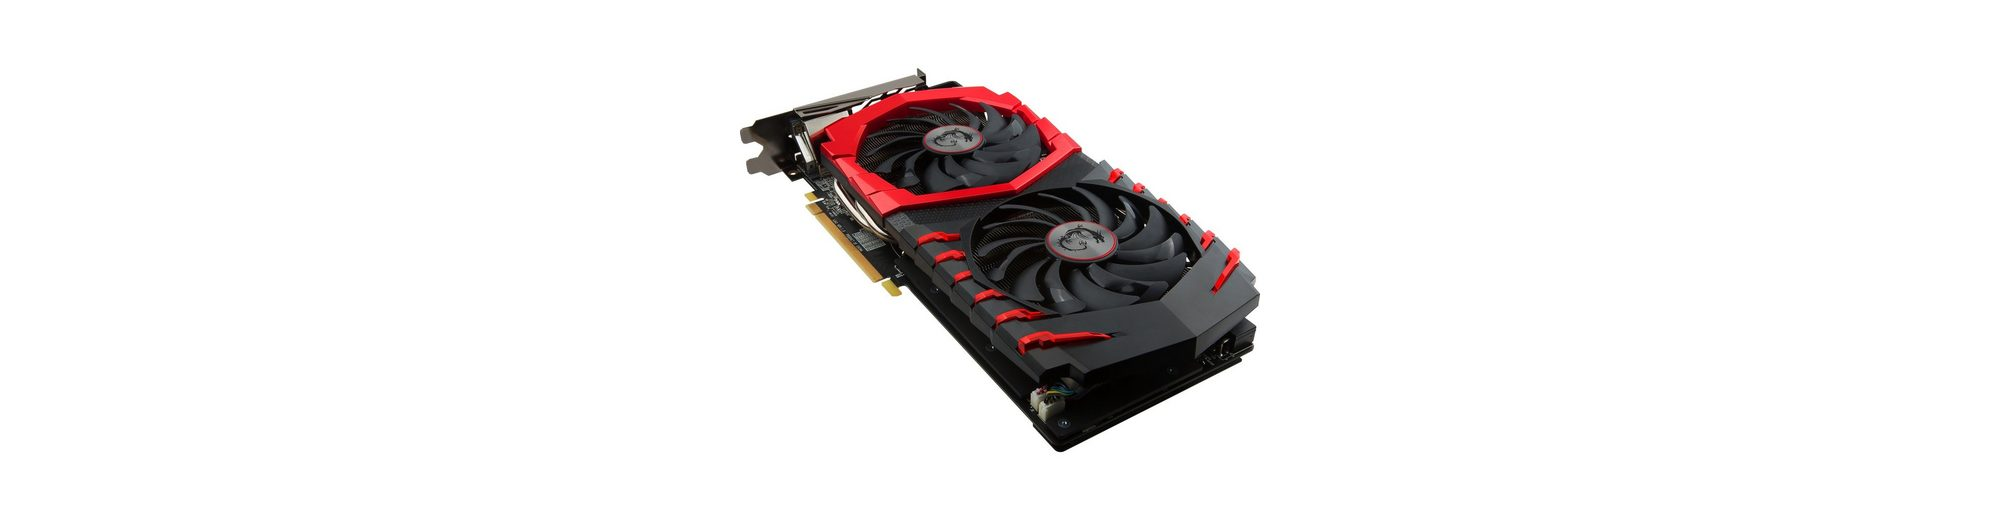 MSI Grafikkarte »Radeon RX 480 Gaming X 8G«